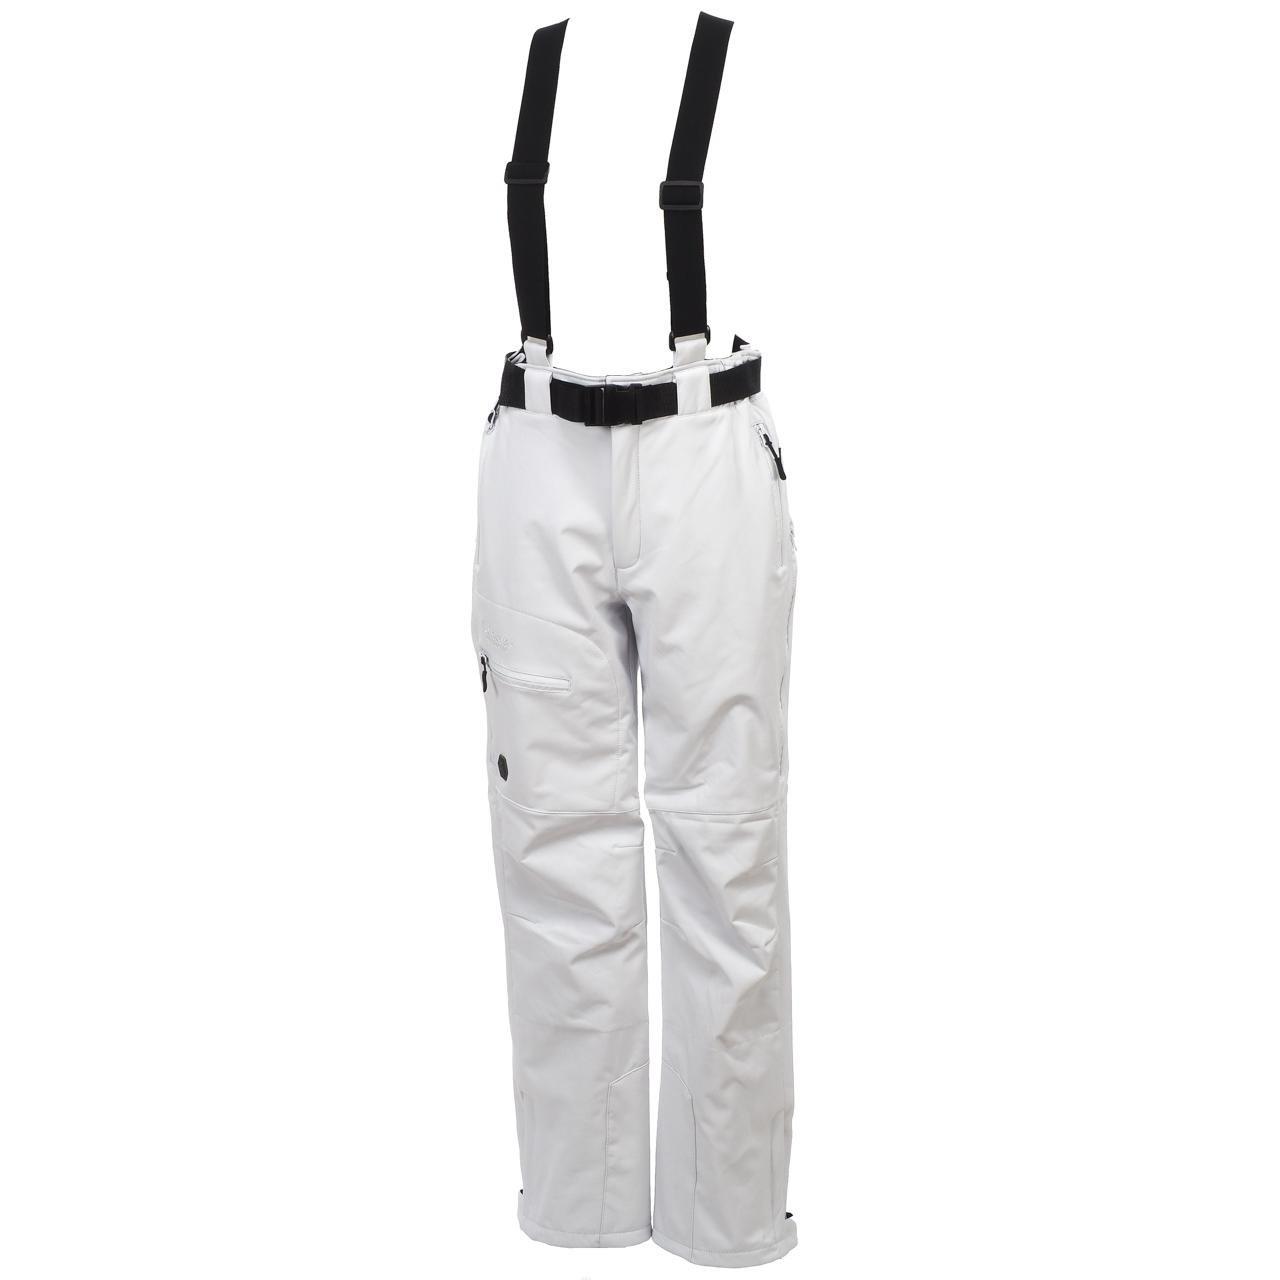 Eldera sportswear Unosoft Blanc skipant - Pantalon de Ski Surf